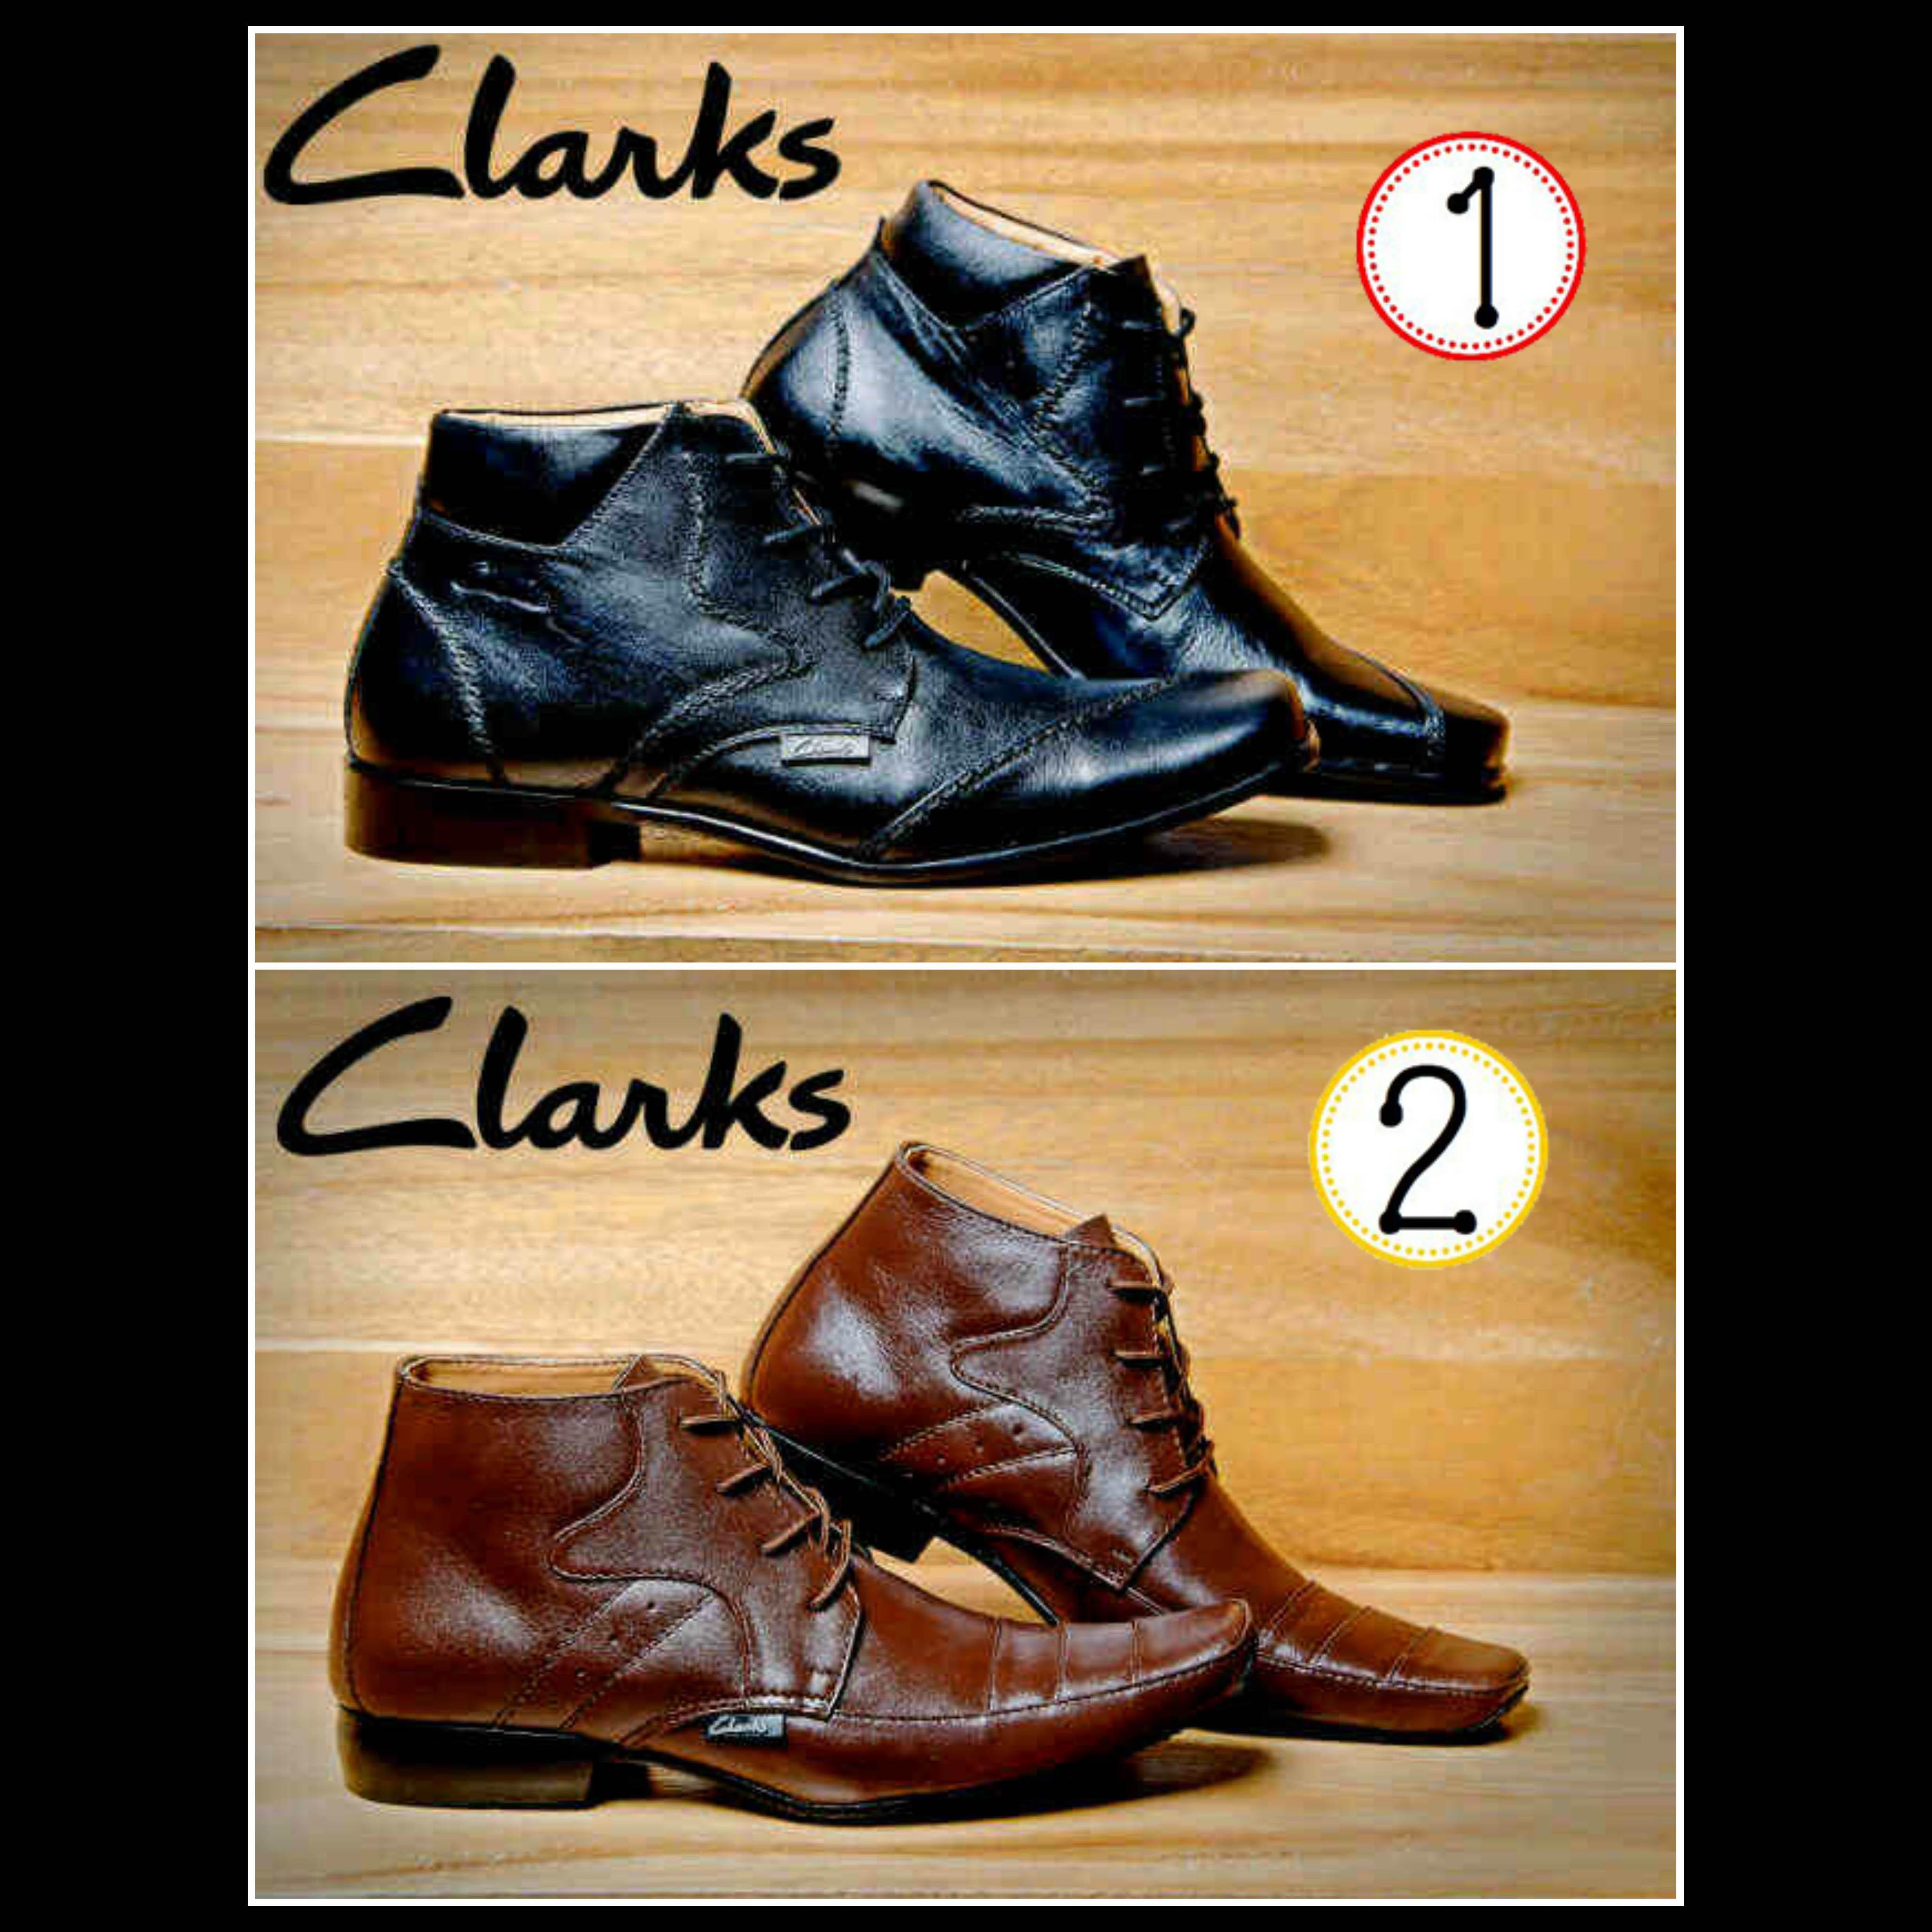 Sepatu Clarks Pantofel Boots Formal Gaya Casual Slop Pria Slip On ... c63a1b3ce3